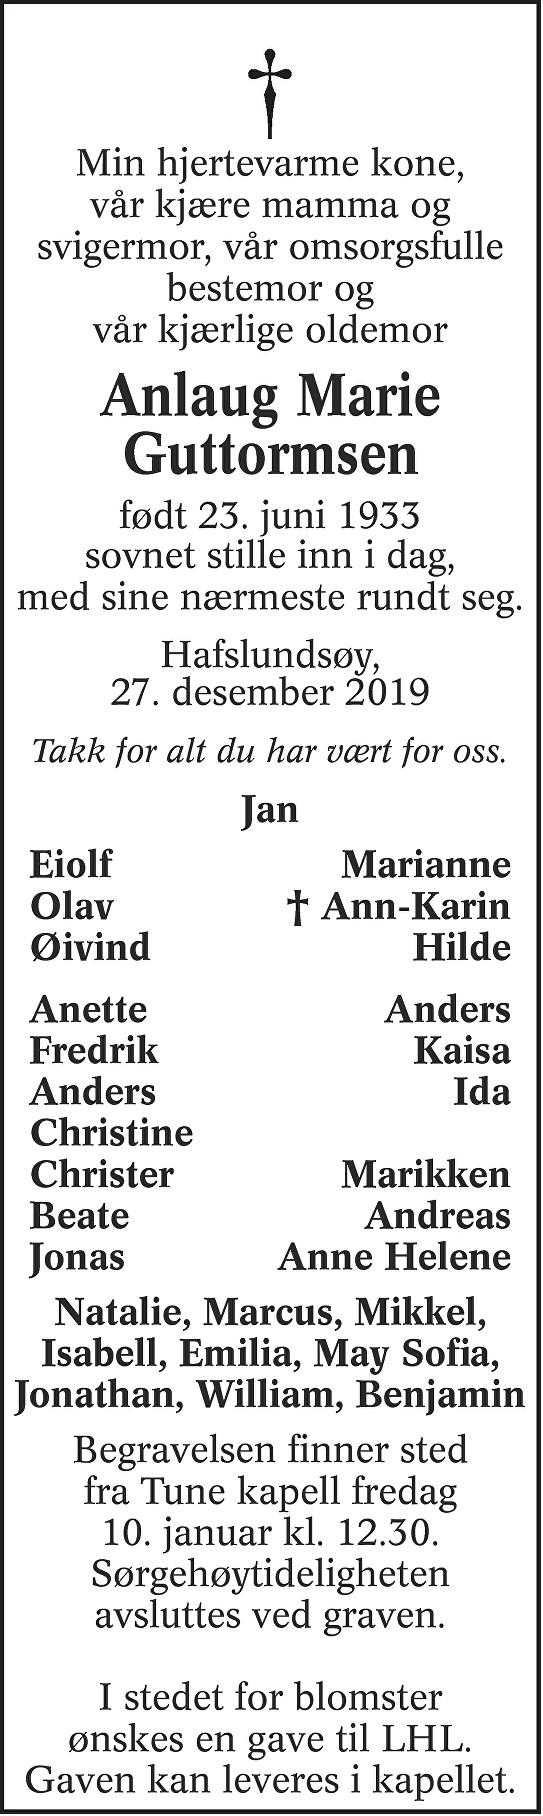 Anlaug Marie Guttormsen Dødsannonse